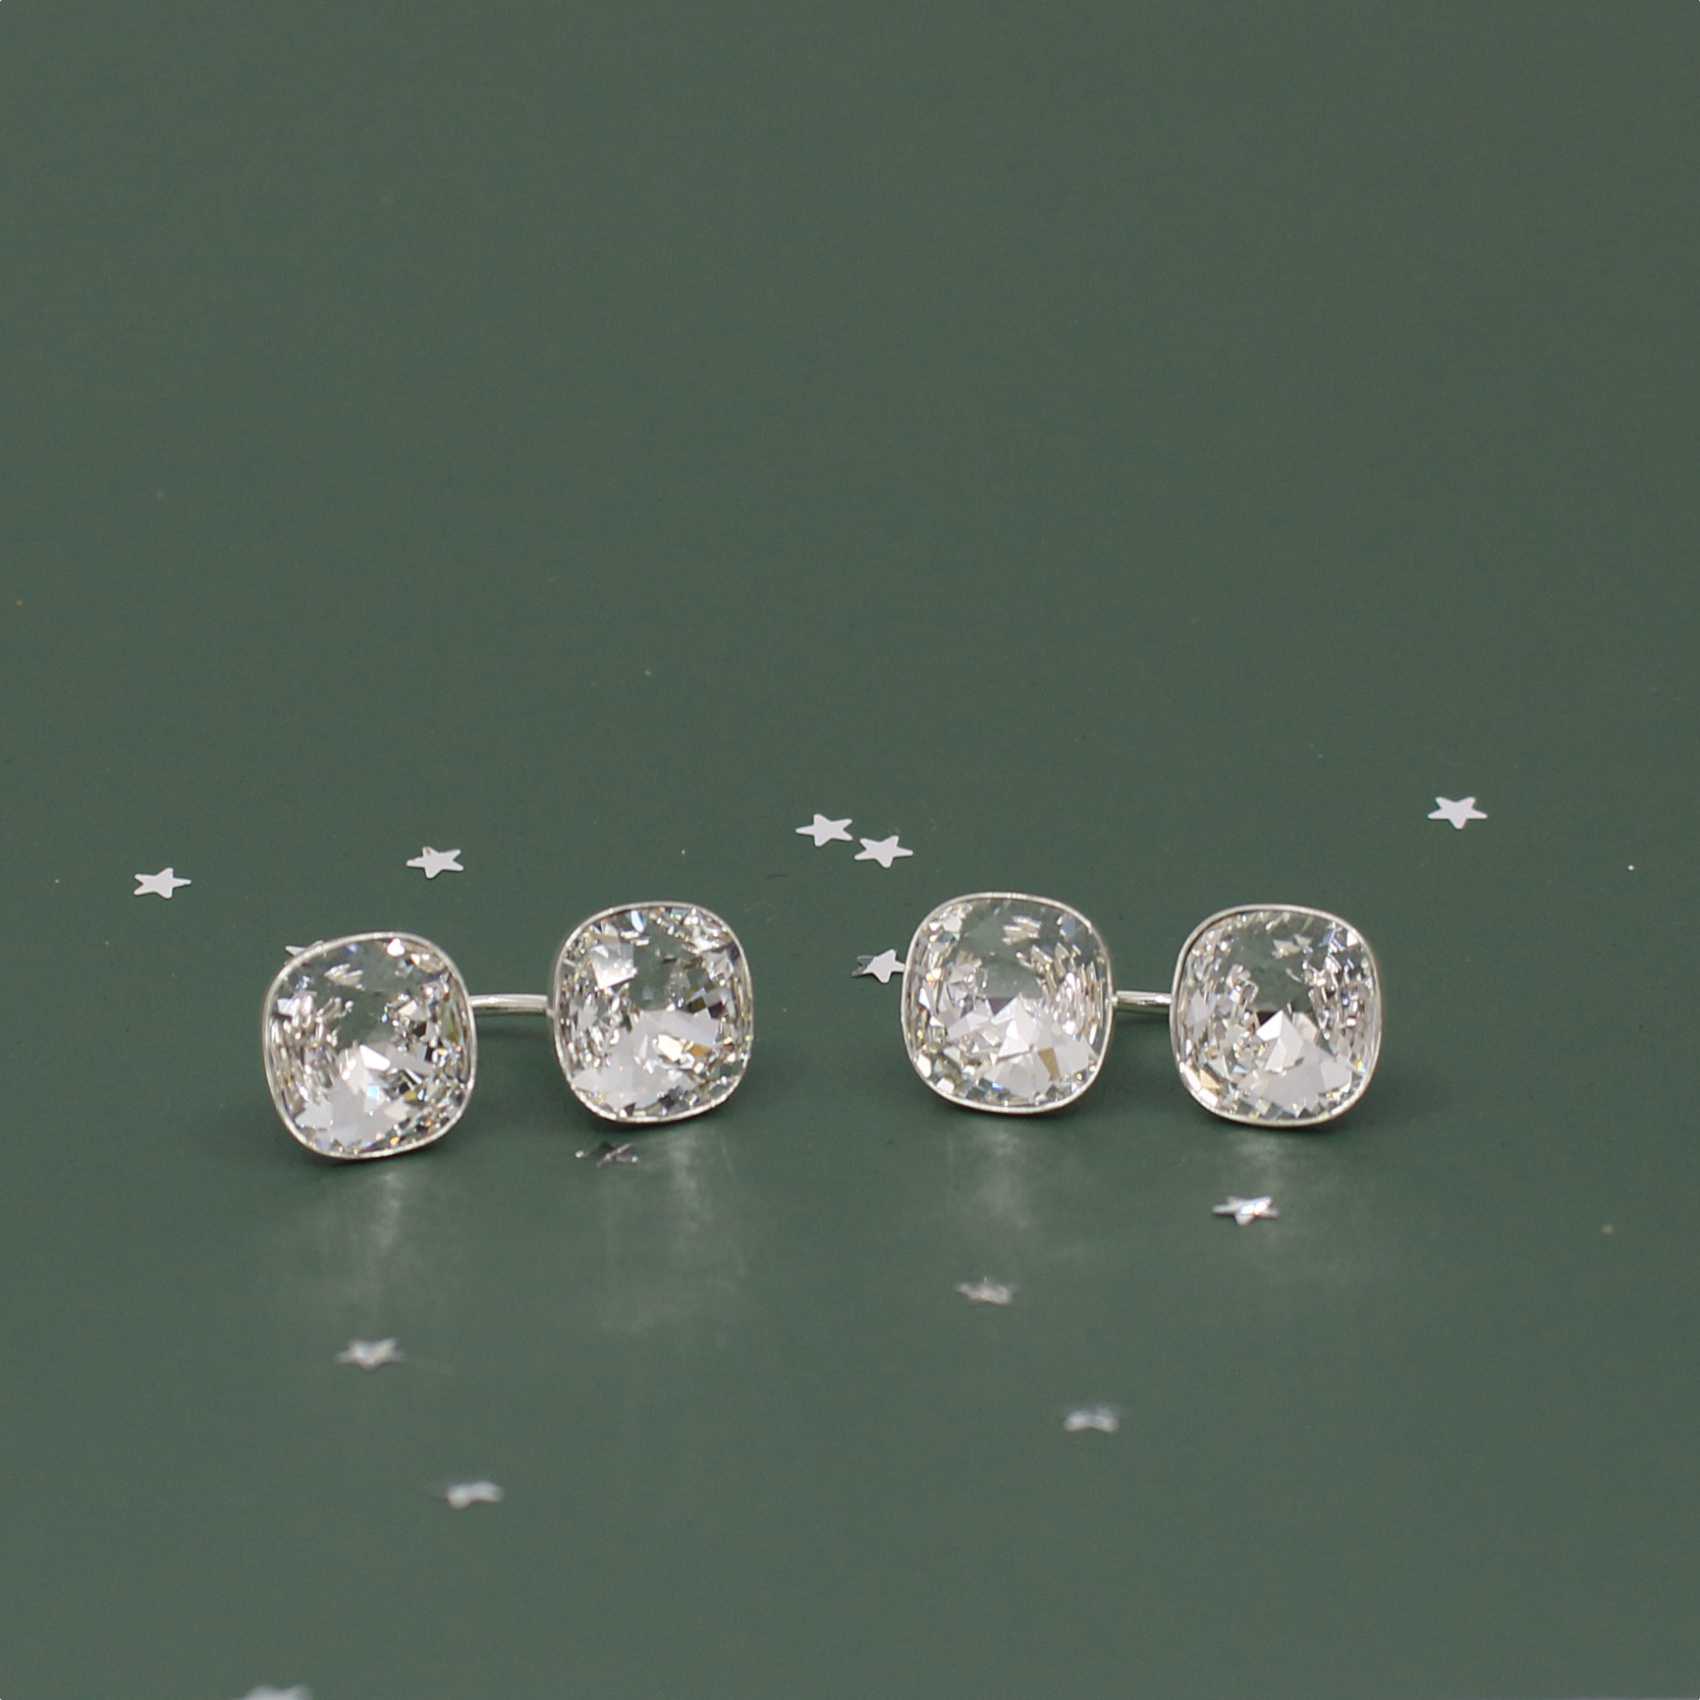 ARLIZI Schmuck Ohrringe Swarovski Kristall Sterling Silber